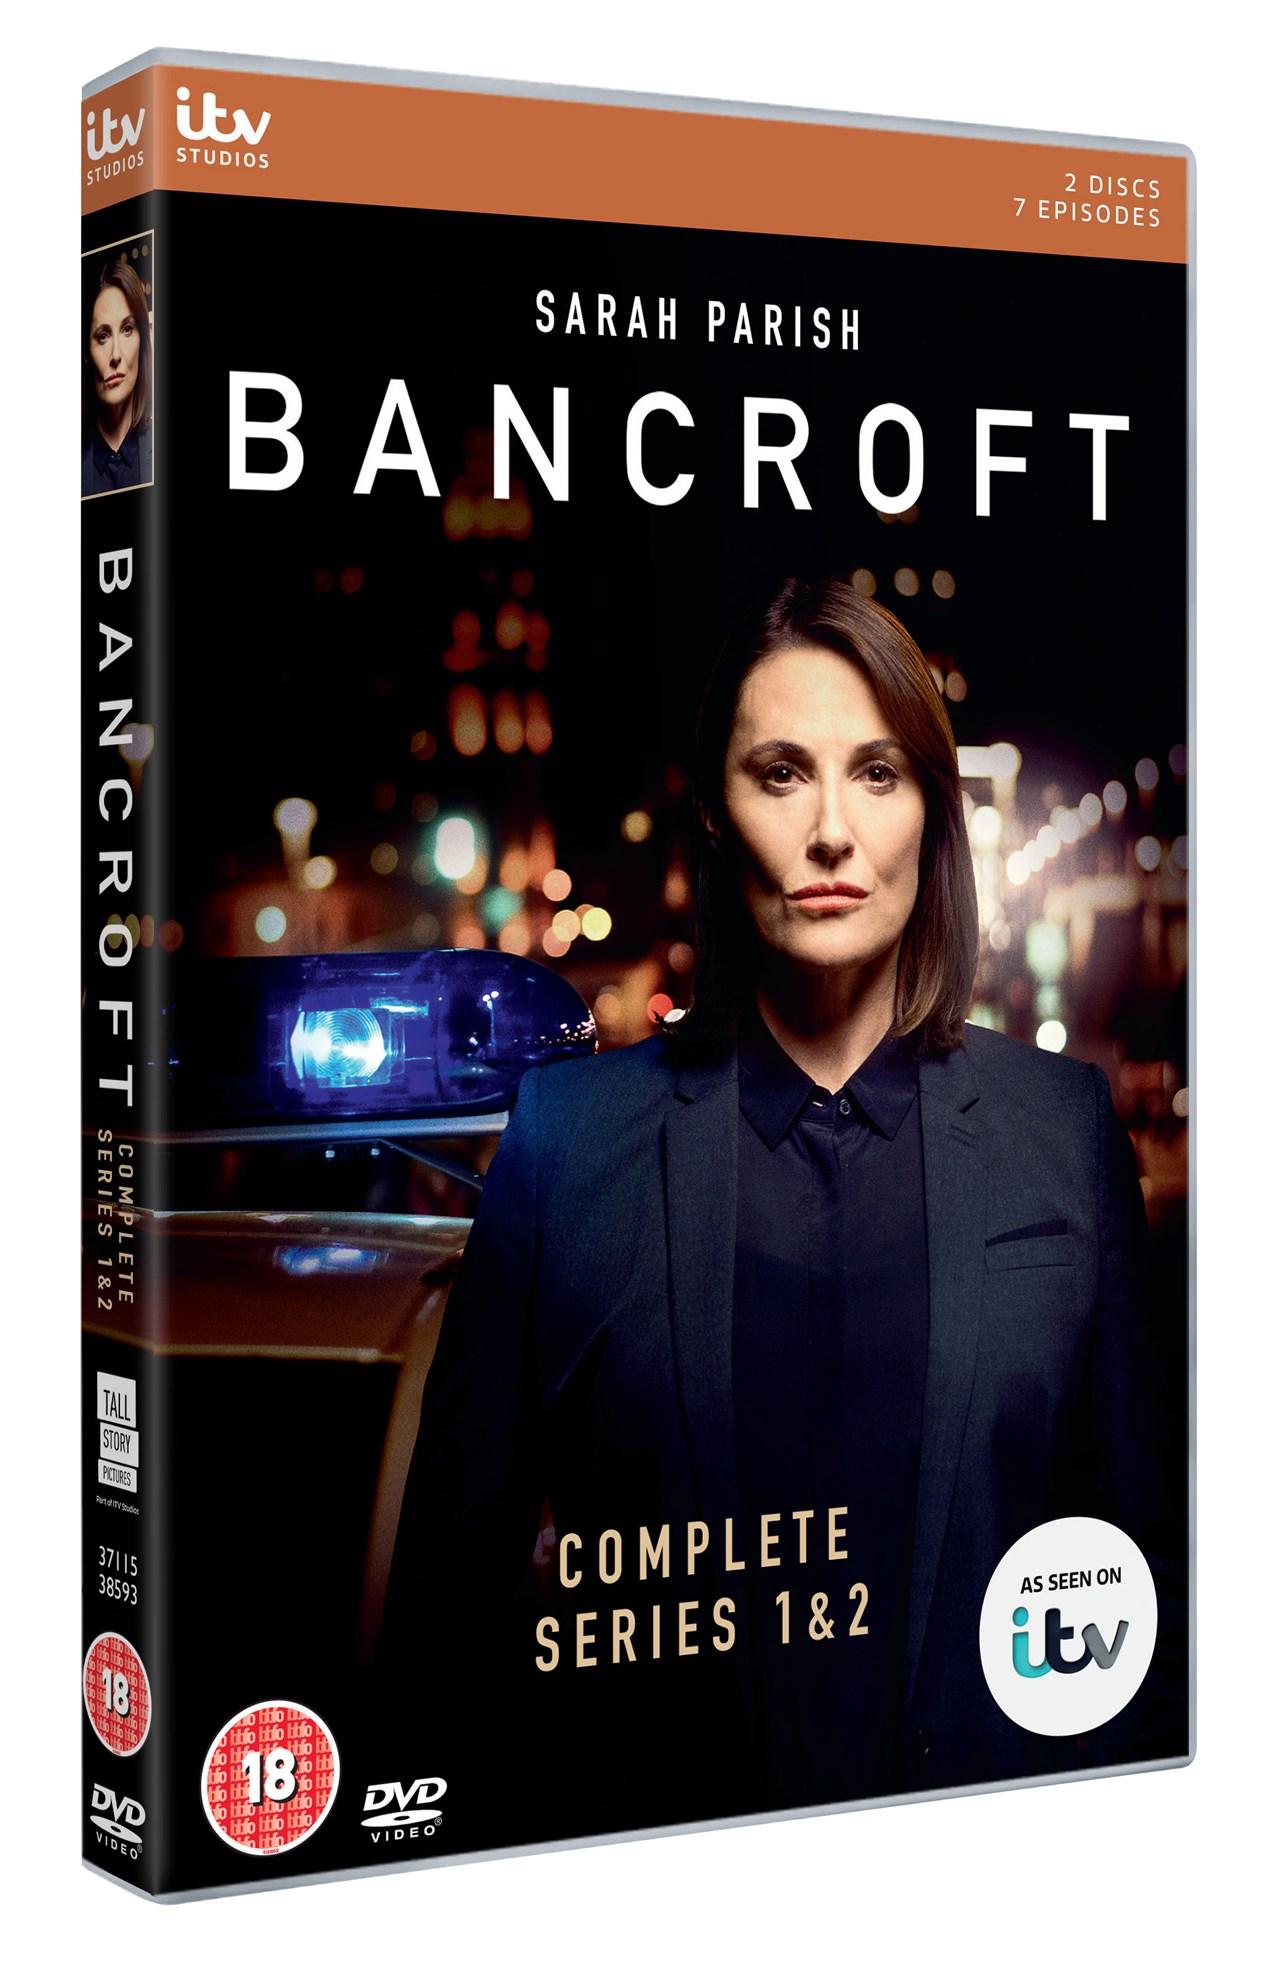 Bancroft: Complete Series 1 & 2 - 2